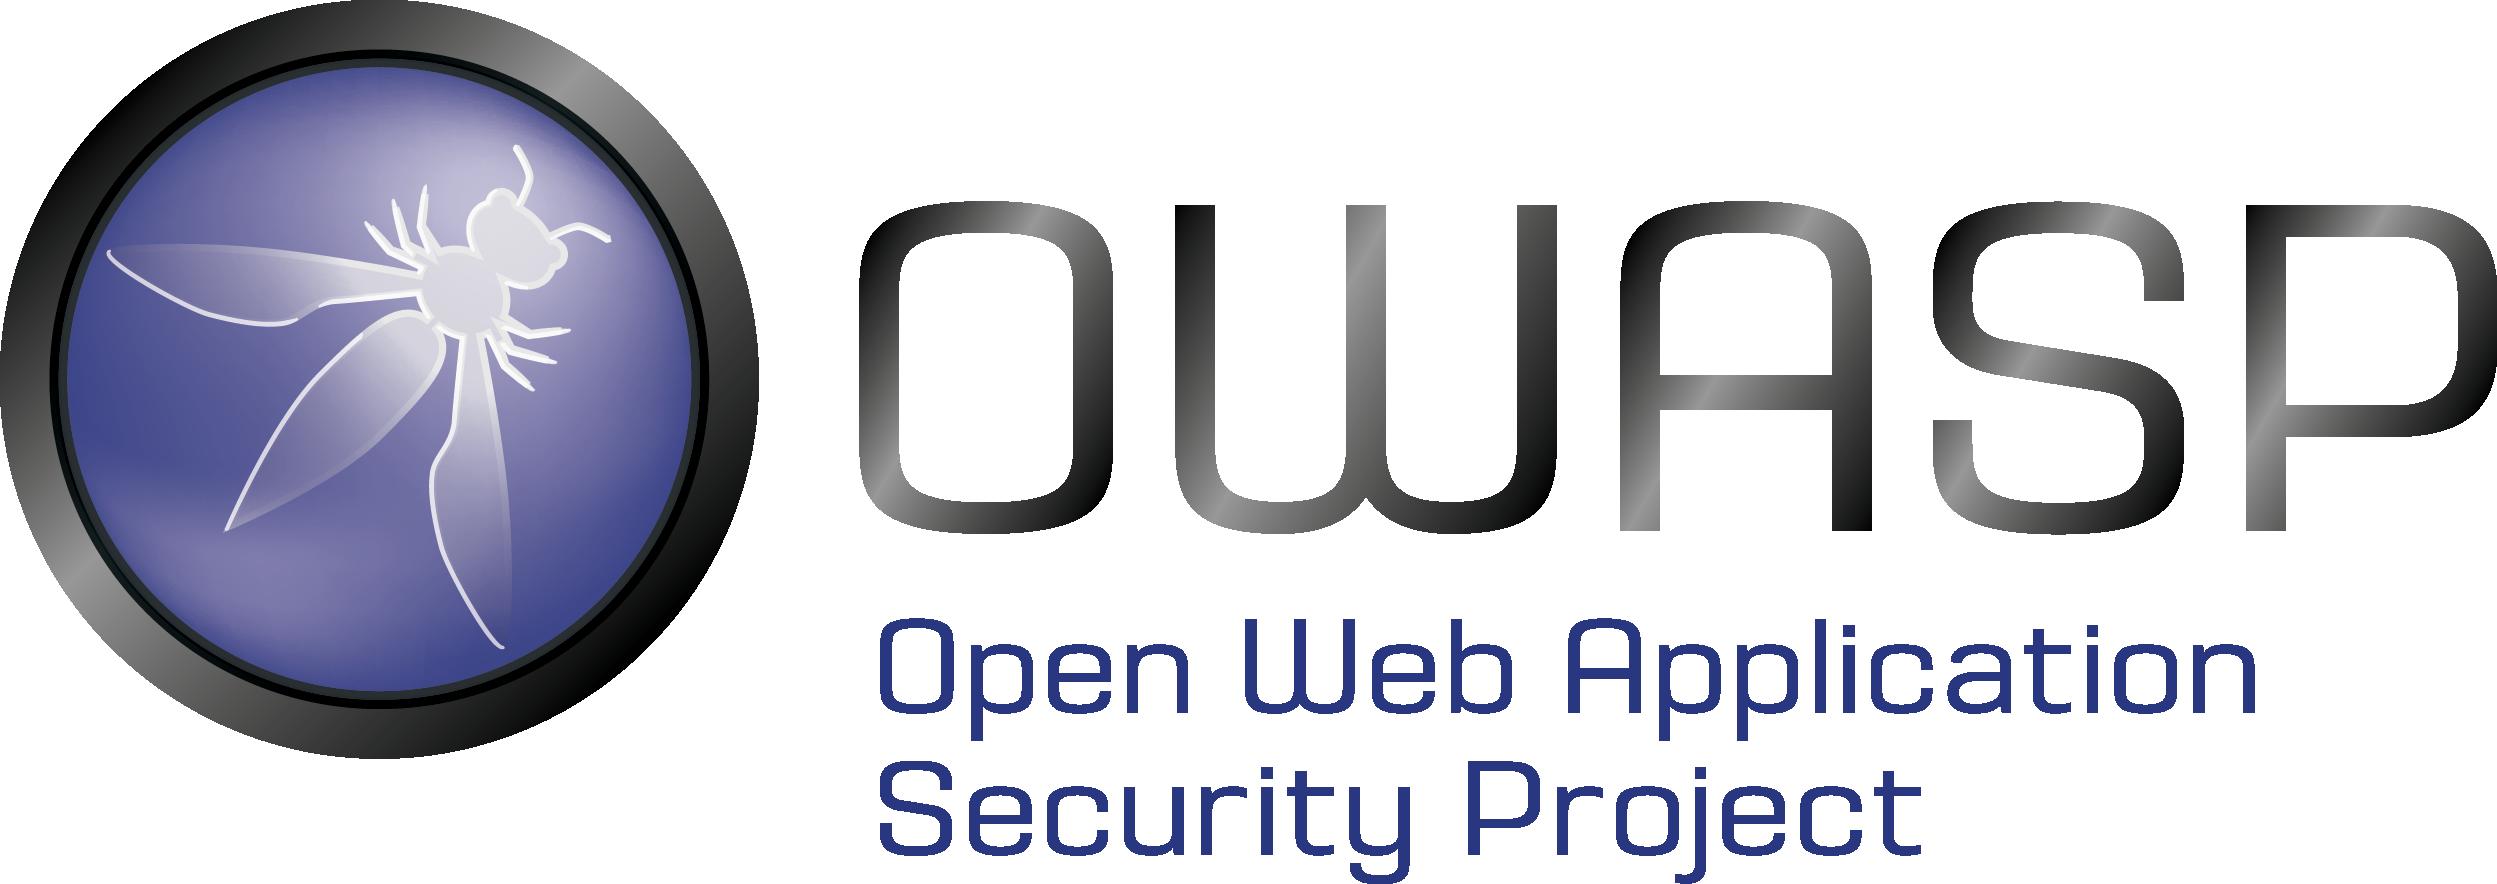 owasp_logo